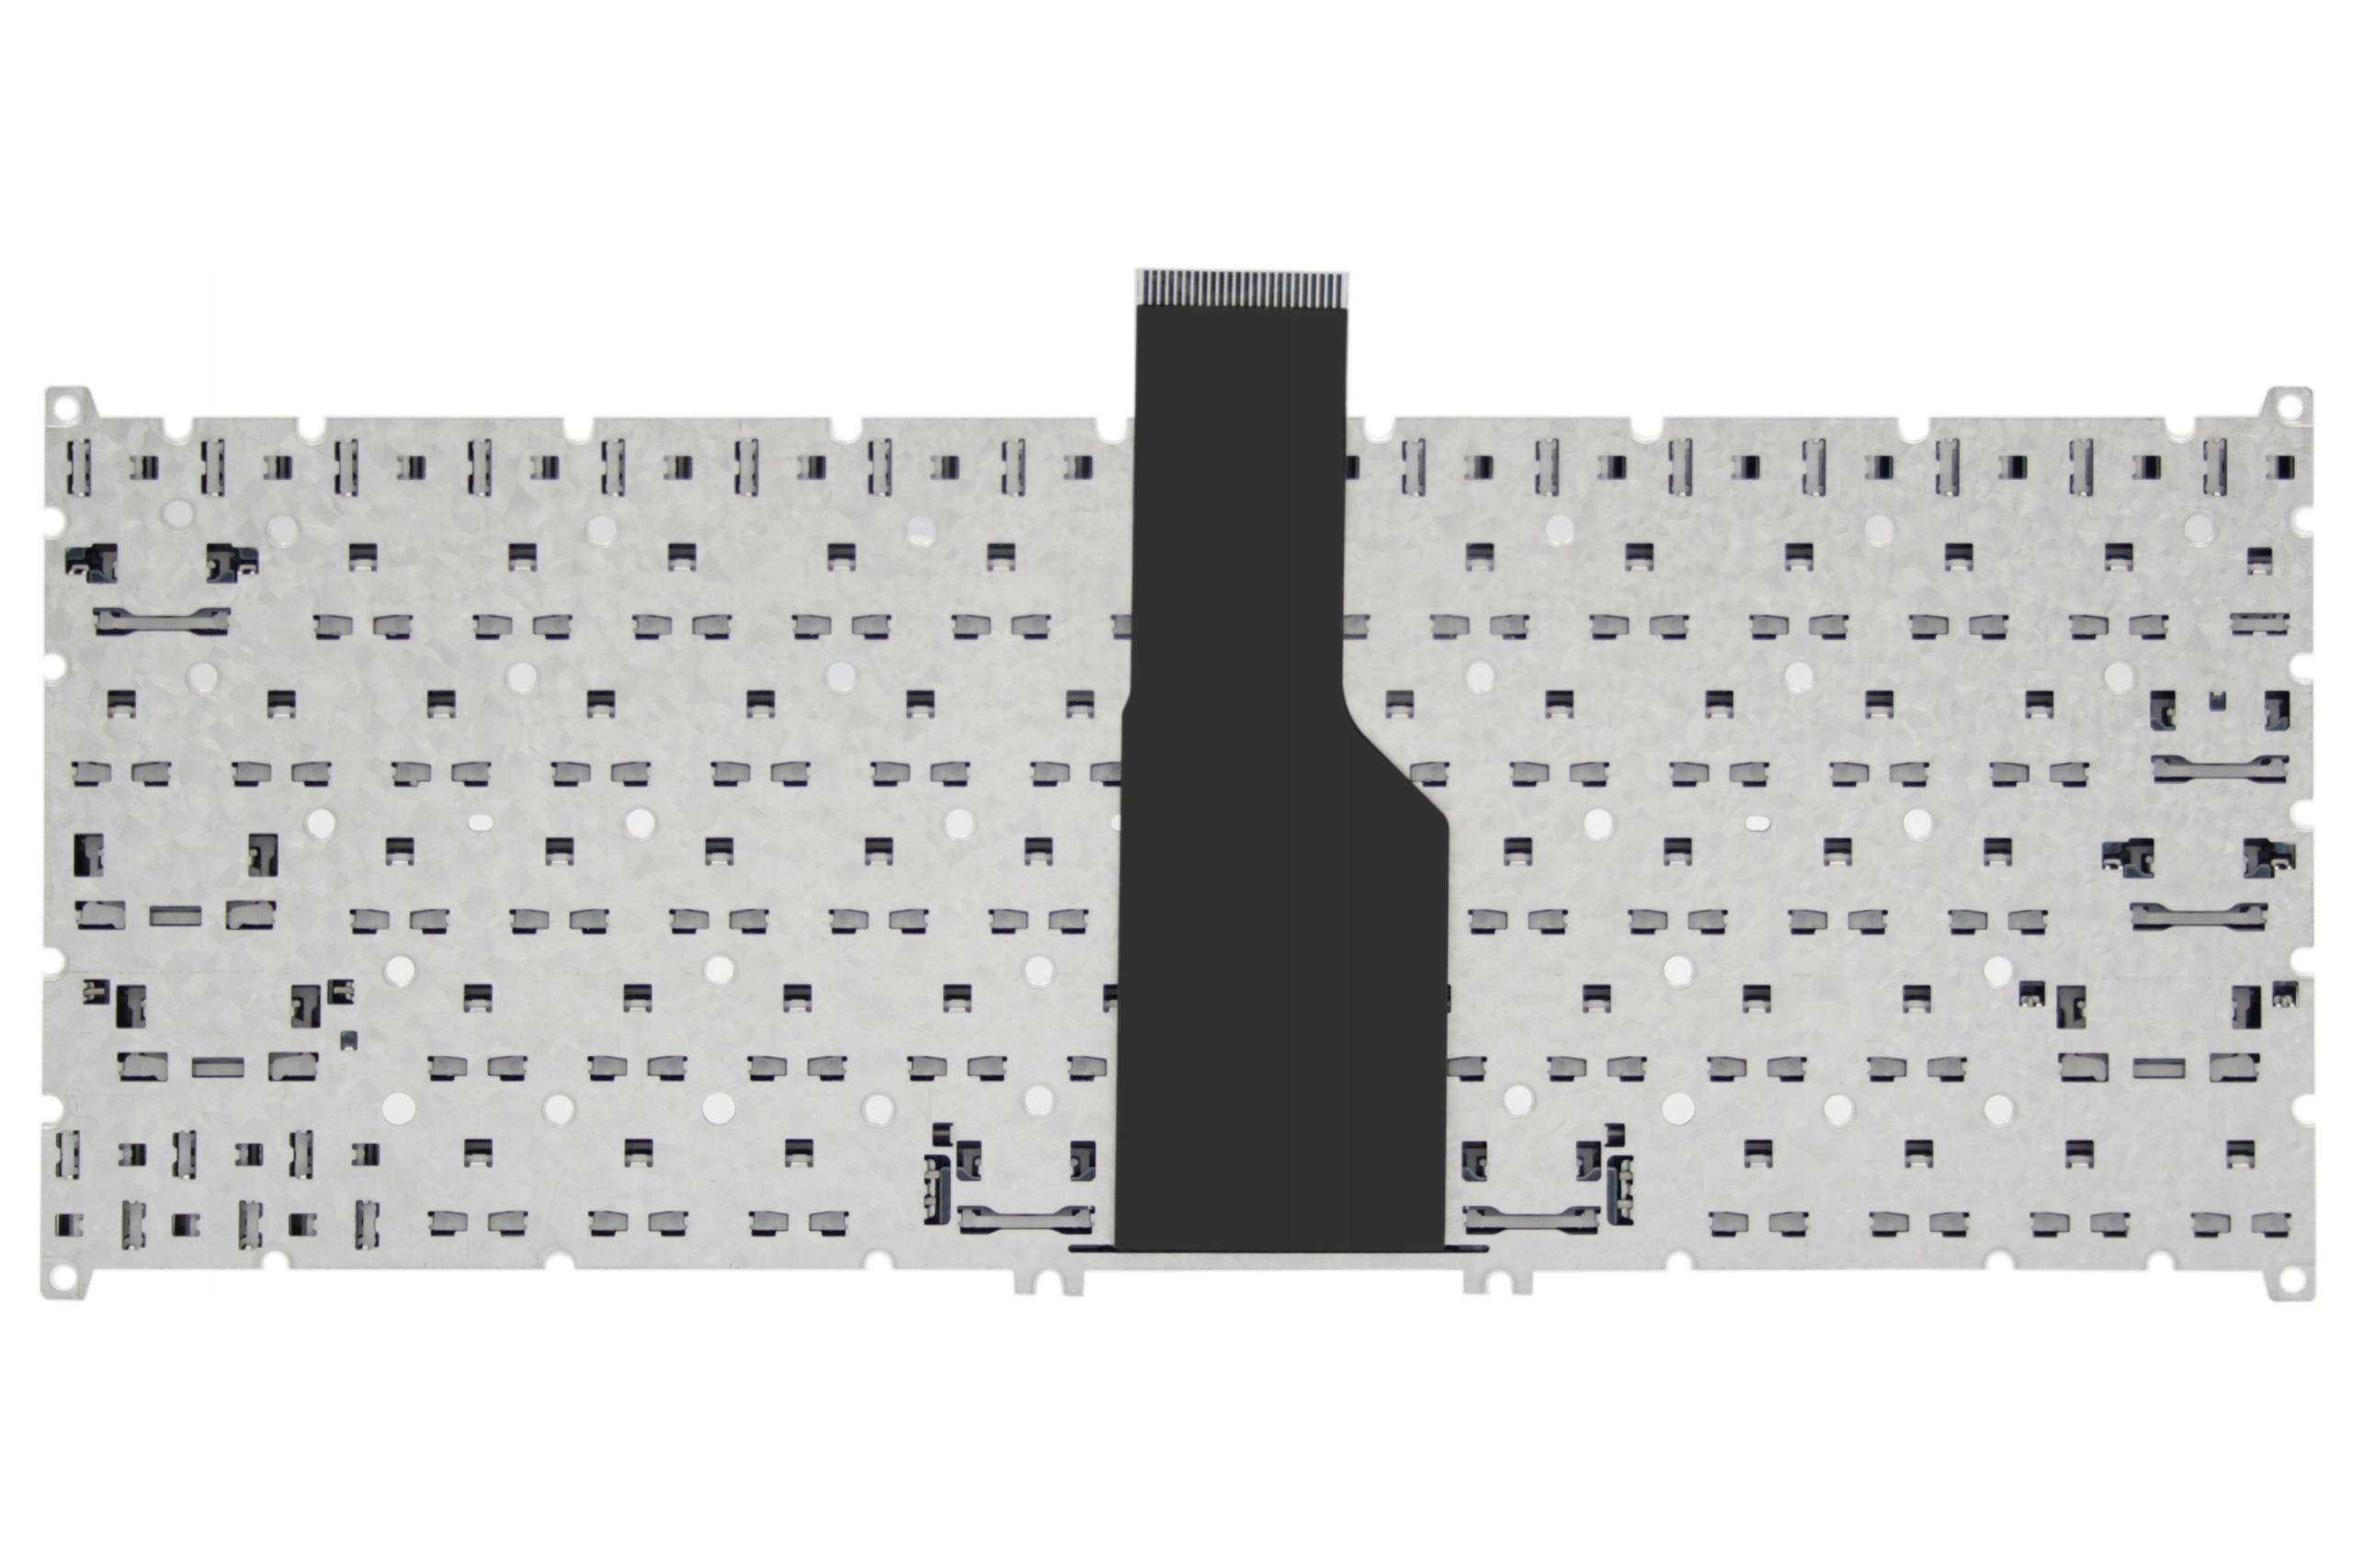 KLAWIATURA ACER ASPIRE V5 V5-121 V5-171 - Klawiatury do laptopów